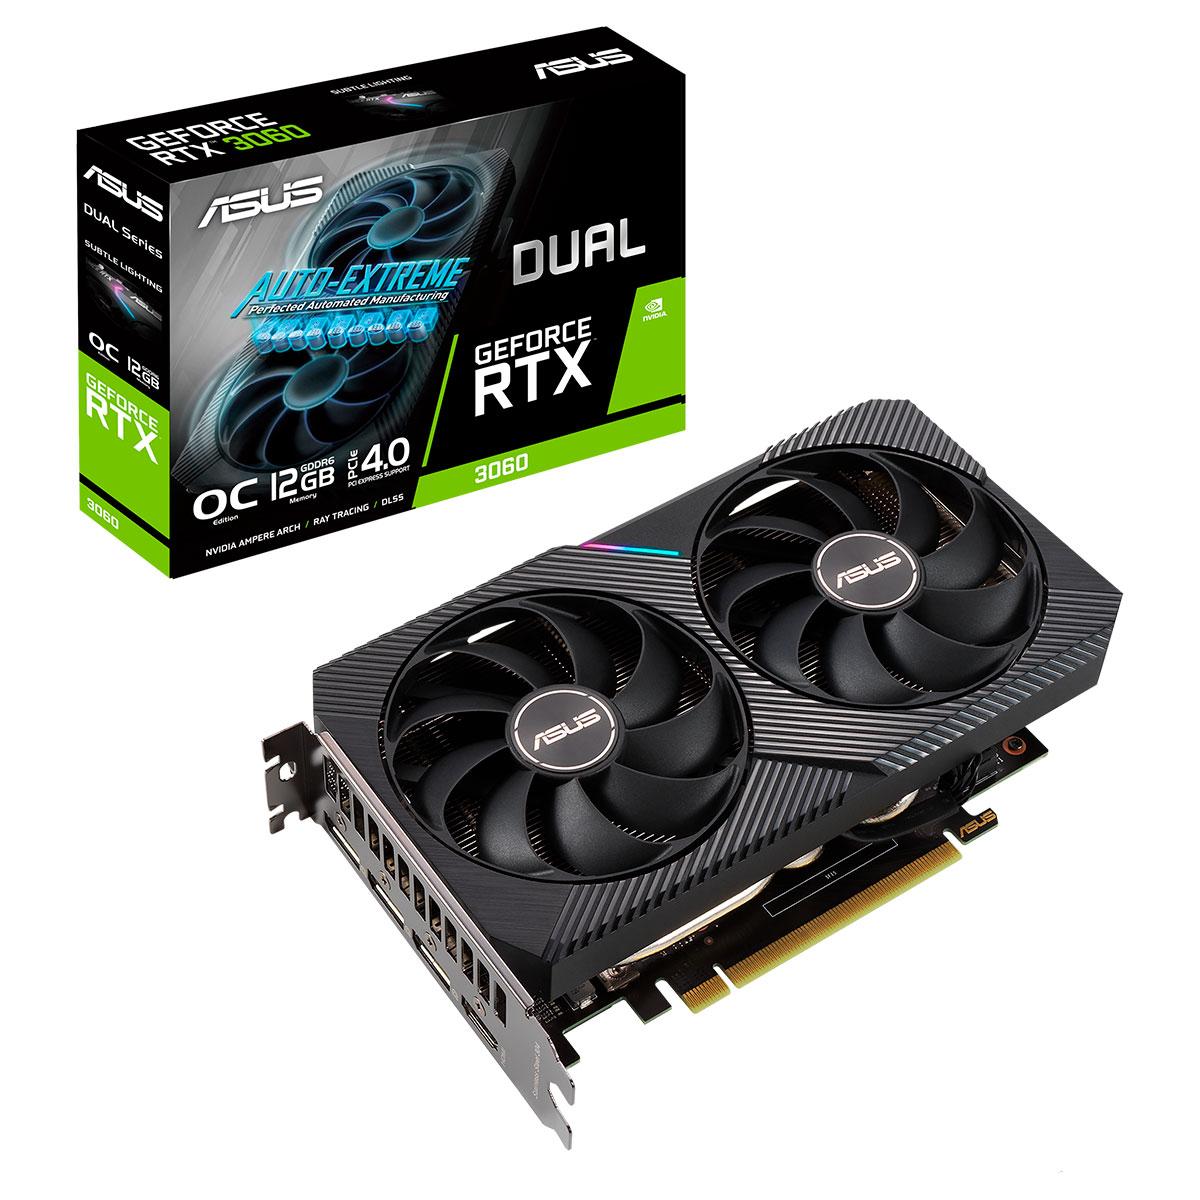 Placa de Vídeo Asus GeForce RTX 3060 OC Edition, 12GB, GDDR6, 192 Bits - DUAL-RTX3060-O12G